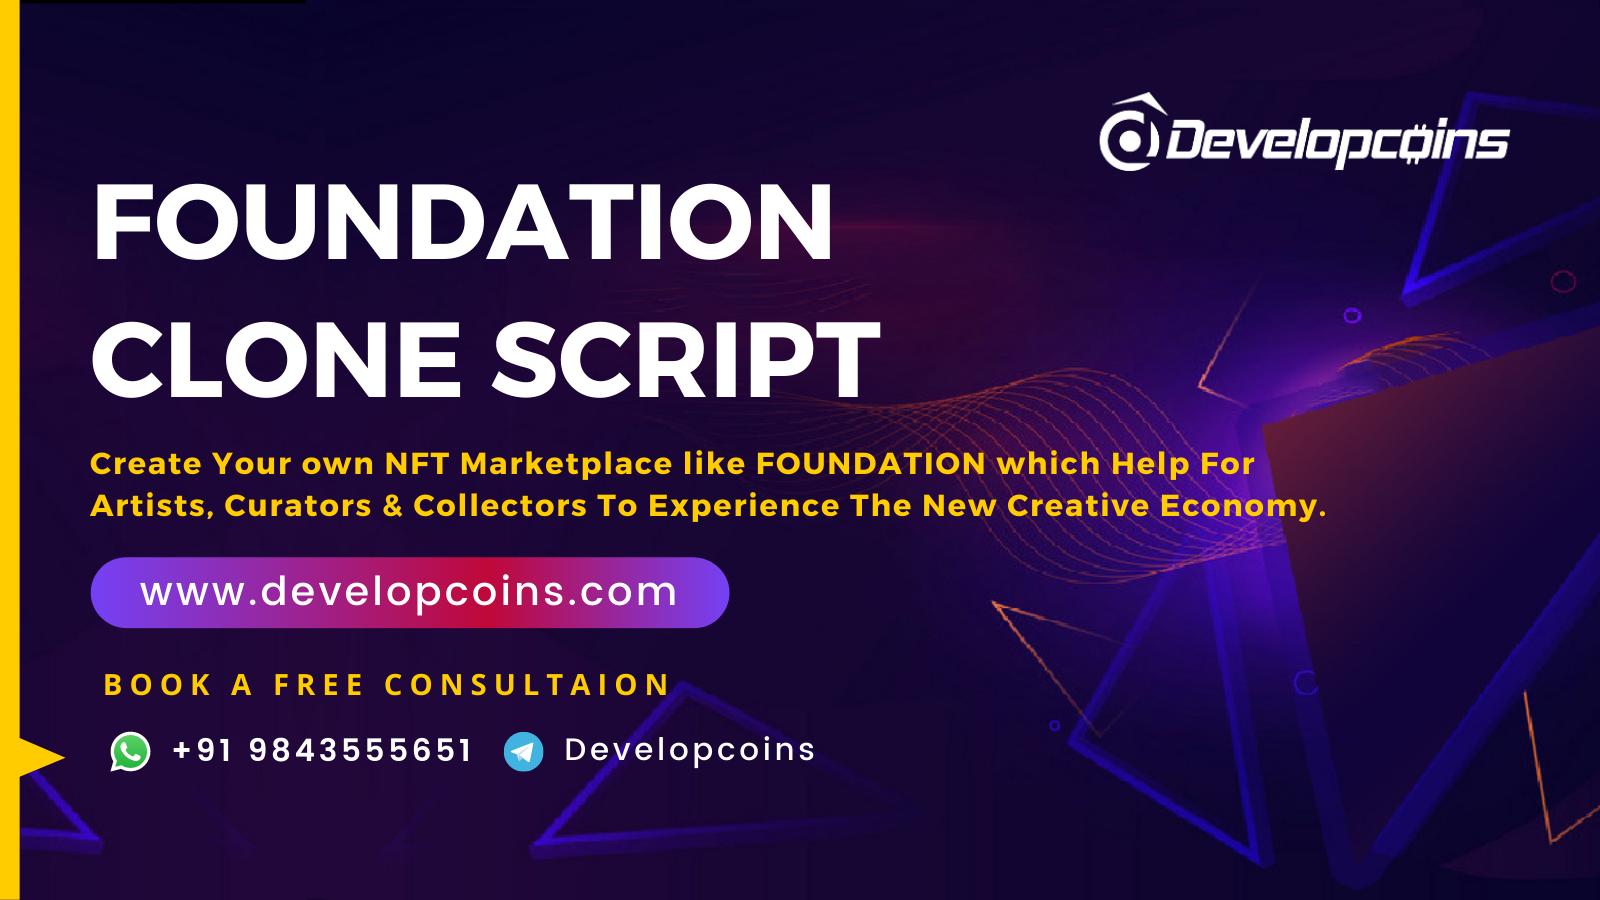 Foundation Clone Script To Create NFT Marketplace Like Foundation